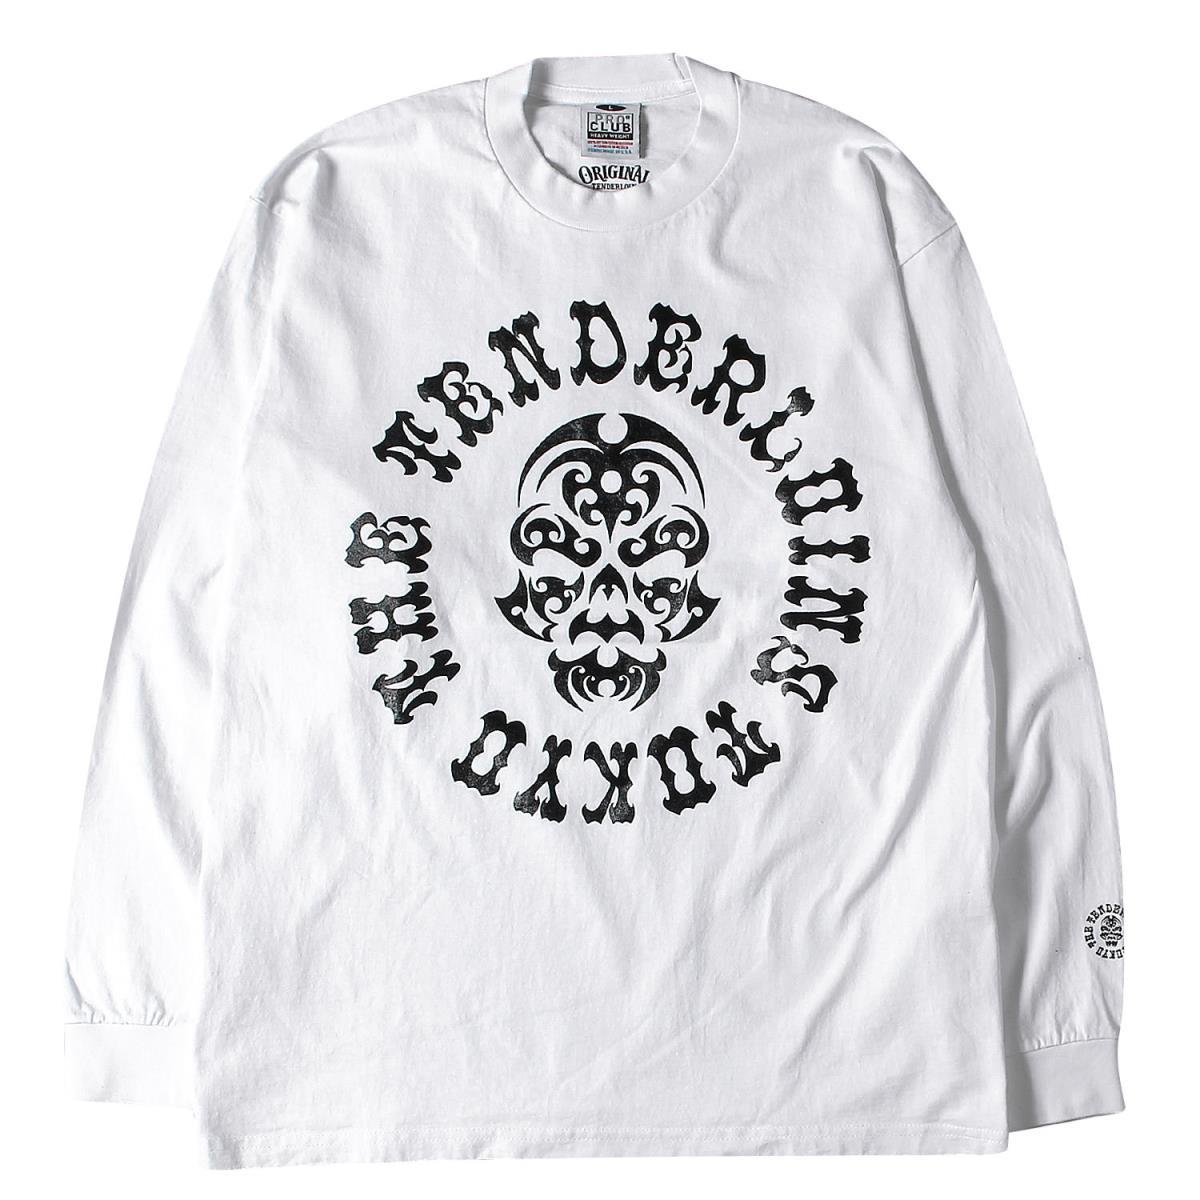 TENDERLOIN テンダーロイン Tシャツ 17AW ボルネオスカル ヘビー ロングスリーブTシャツ T-TEE BS L/S ホワイト L 【メンズ】【美品】【中古】【K2595】